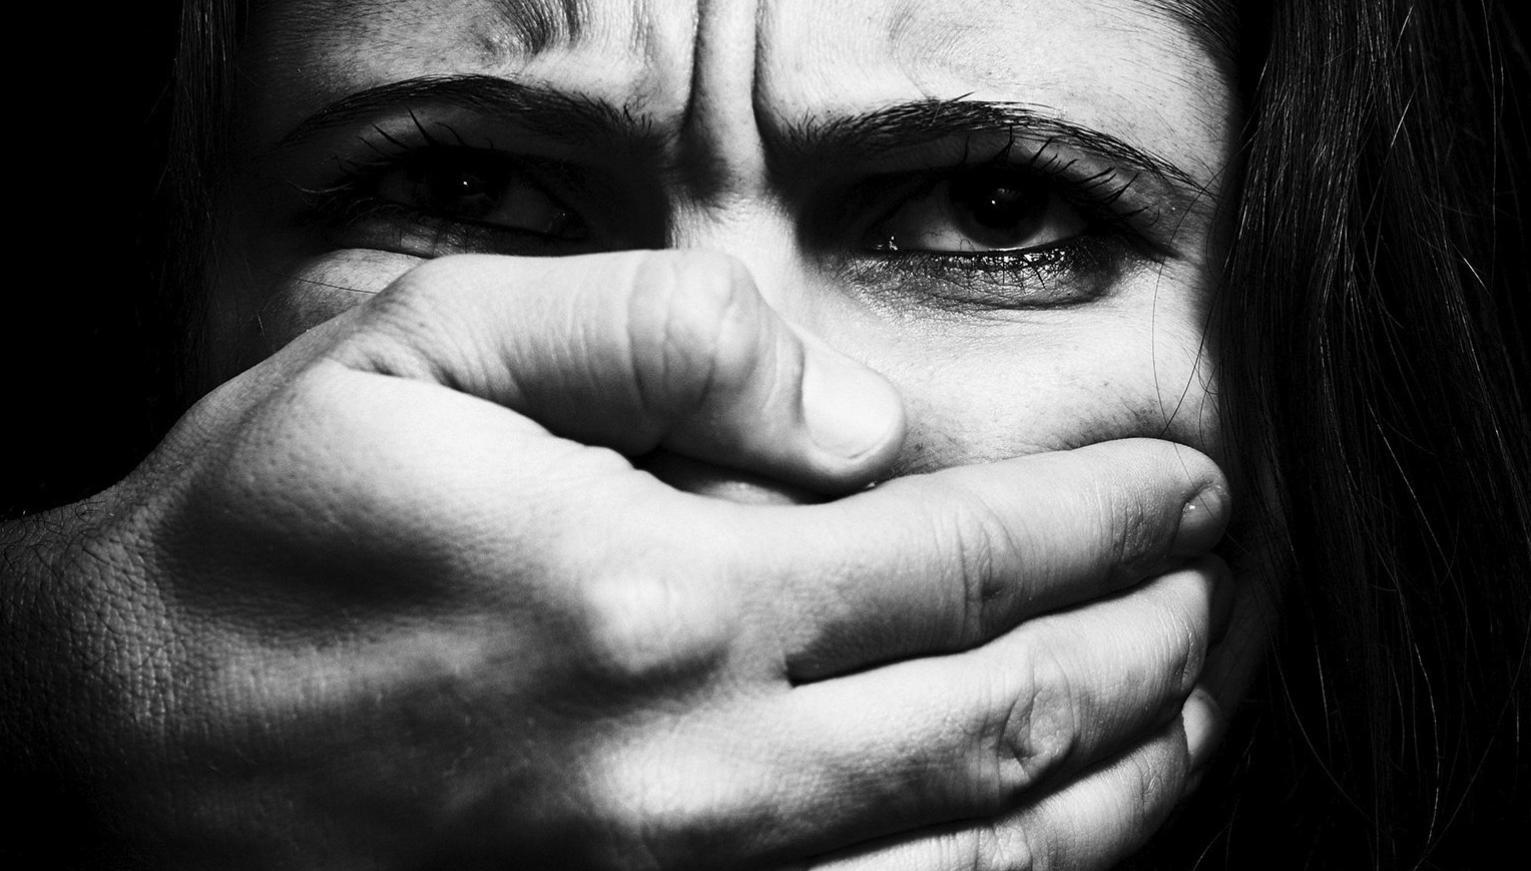 o-violence-against-women-facebooka91a20872